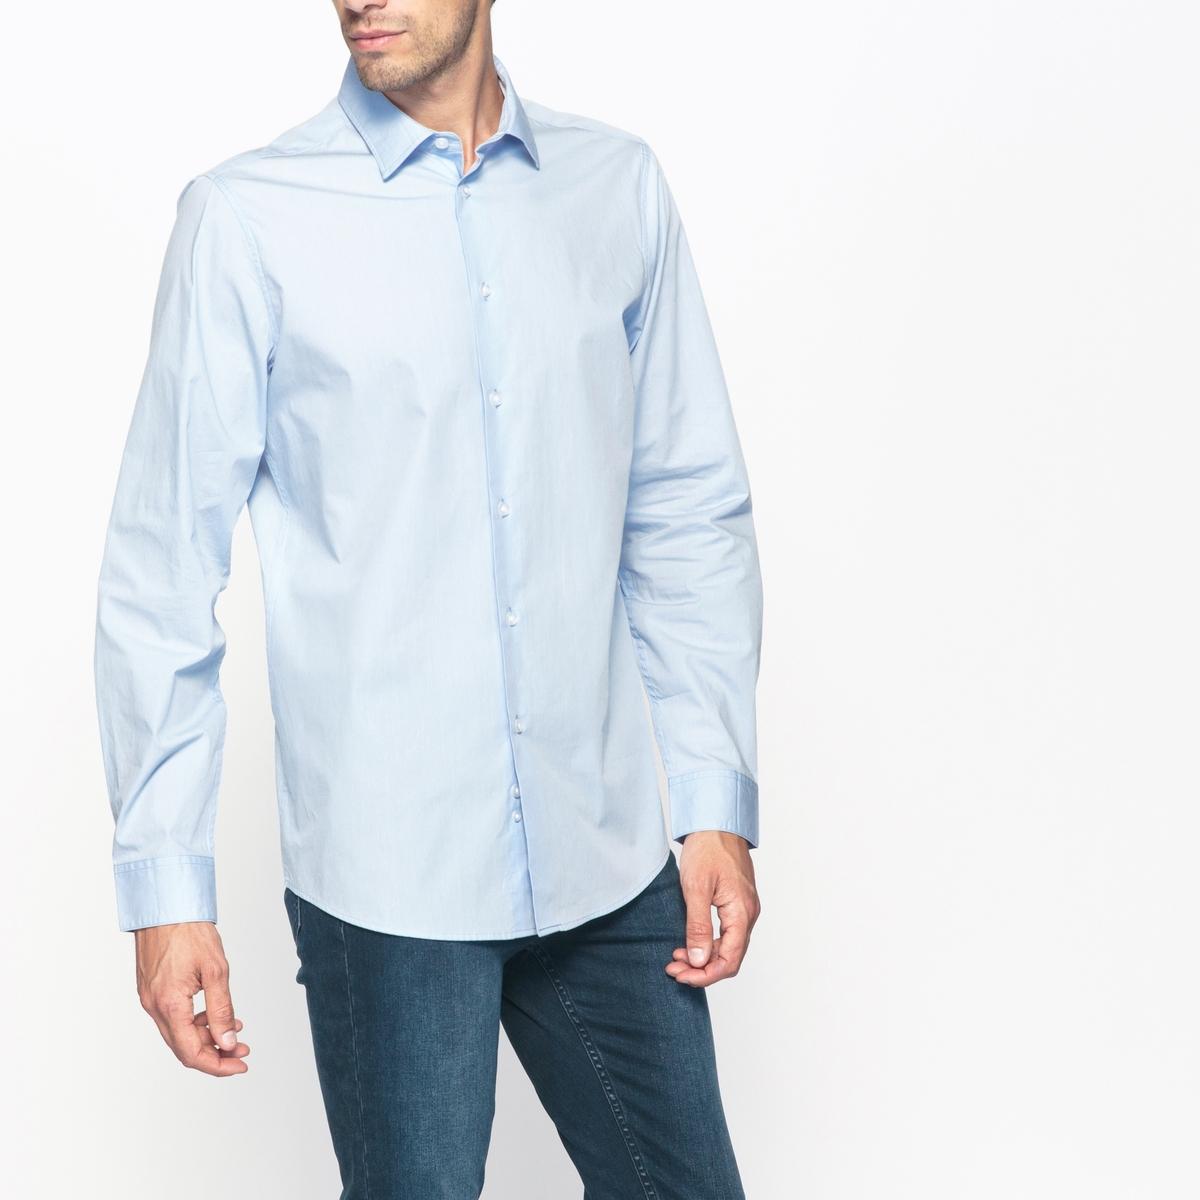 Рубашка узкого покроя, 100% хлопок